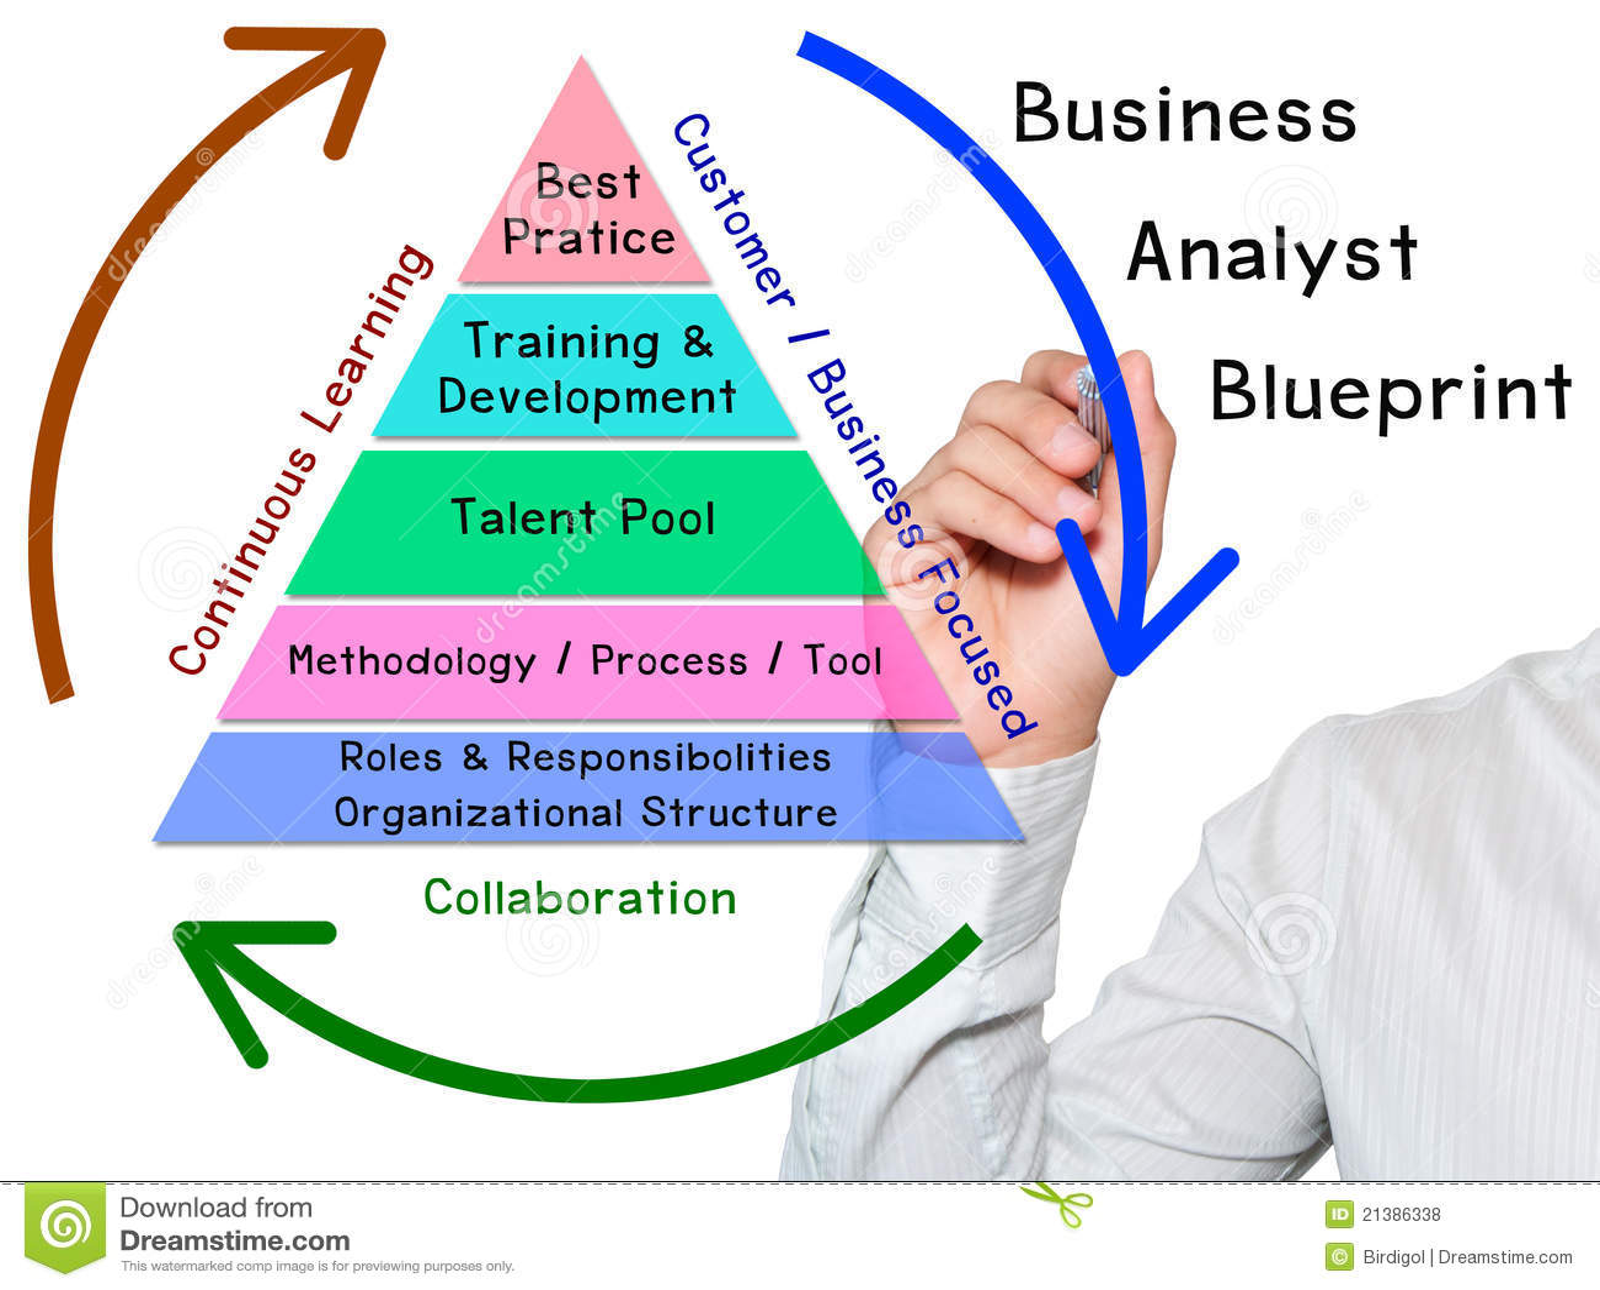 Hand write business analyst blueprint stock photo image of black download hand write business analyst blueprint stock photo image of black data 21386338 malvernweather Choice Image